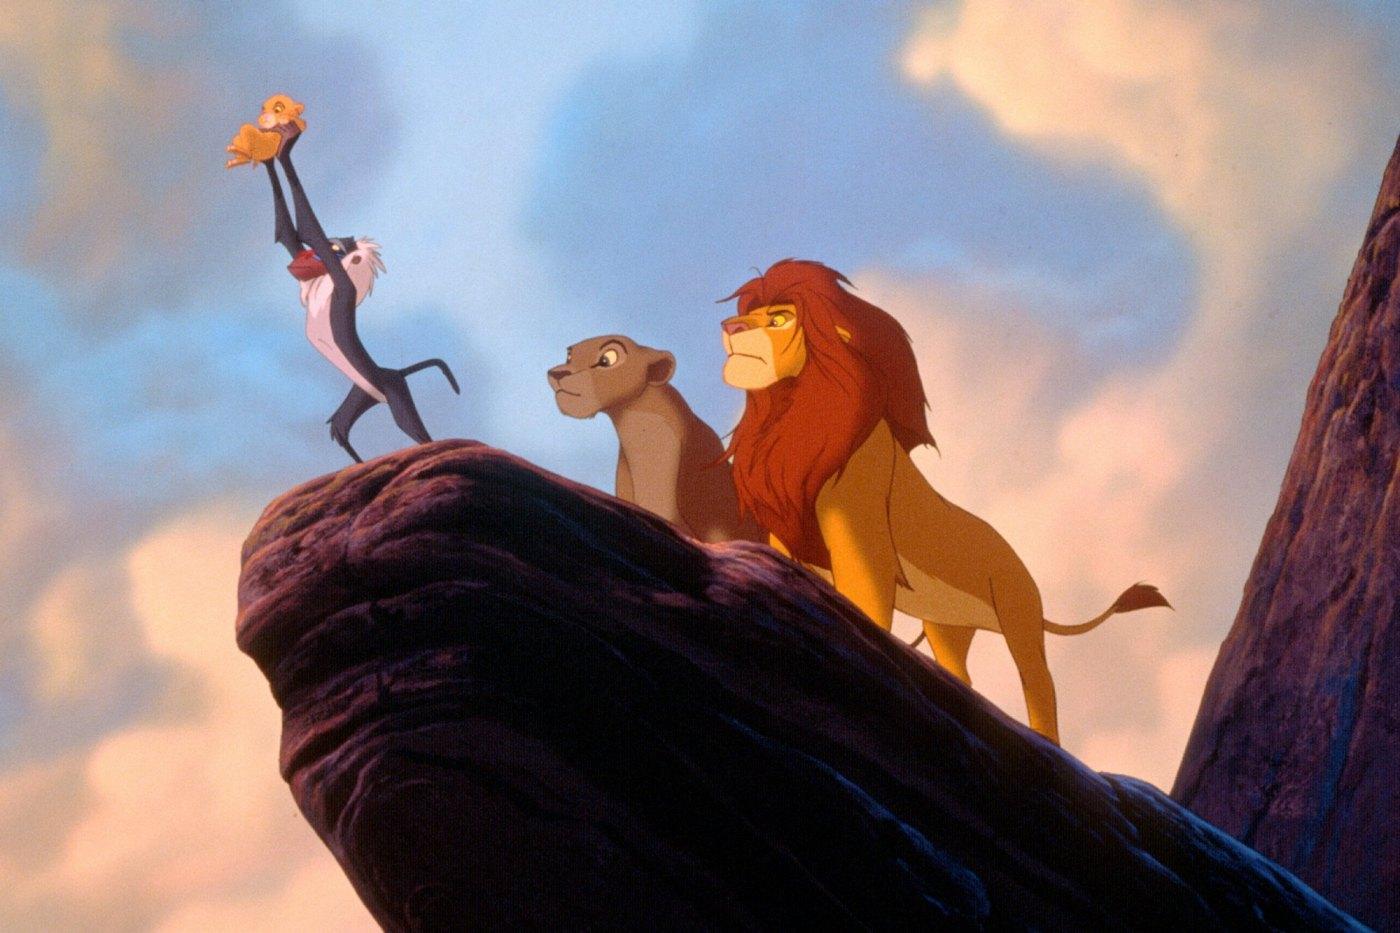 Lion King; Disney; Cartoon; Circle of life